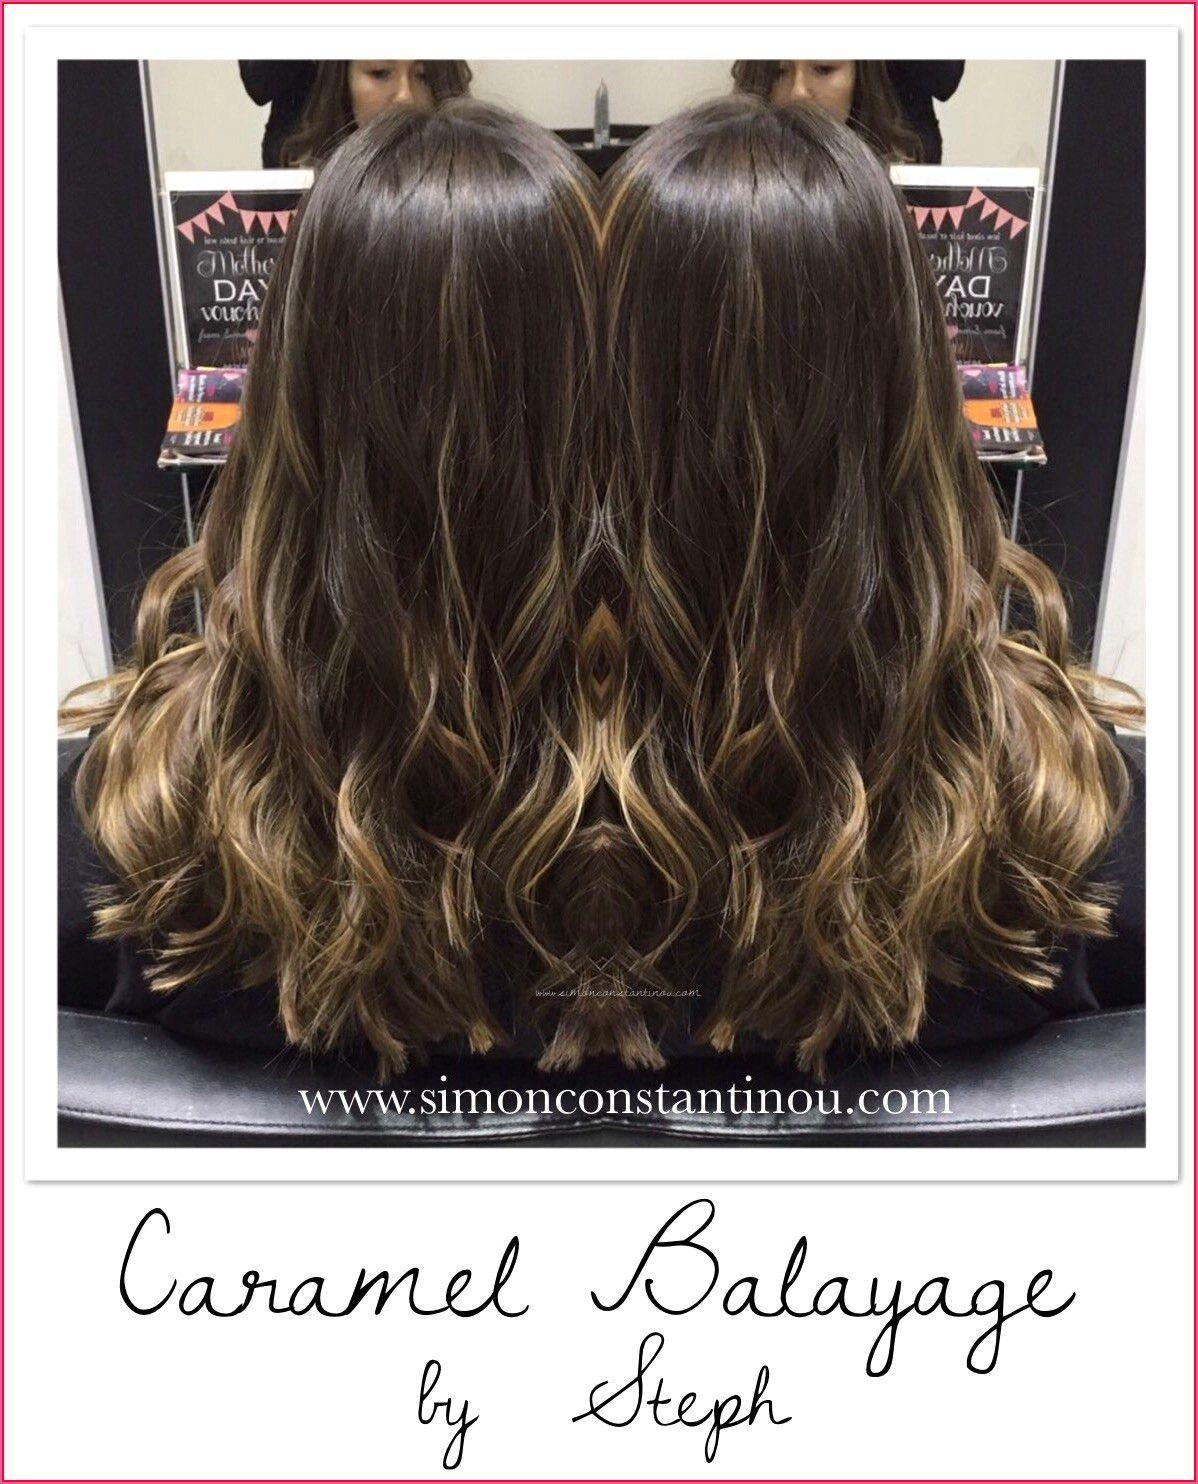 Dauerhafte Haarfarbe Roten Dauerhafte Haarfarbe Roten Dauerhafte Haarfarbe Roten Dauerhafte Haarfarbe Roten W In 2020 Beige Hair Hair Color Chart Brown Hair Dye